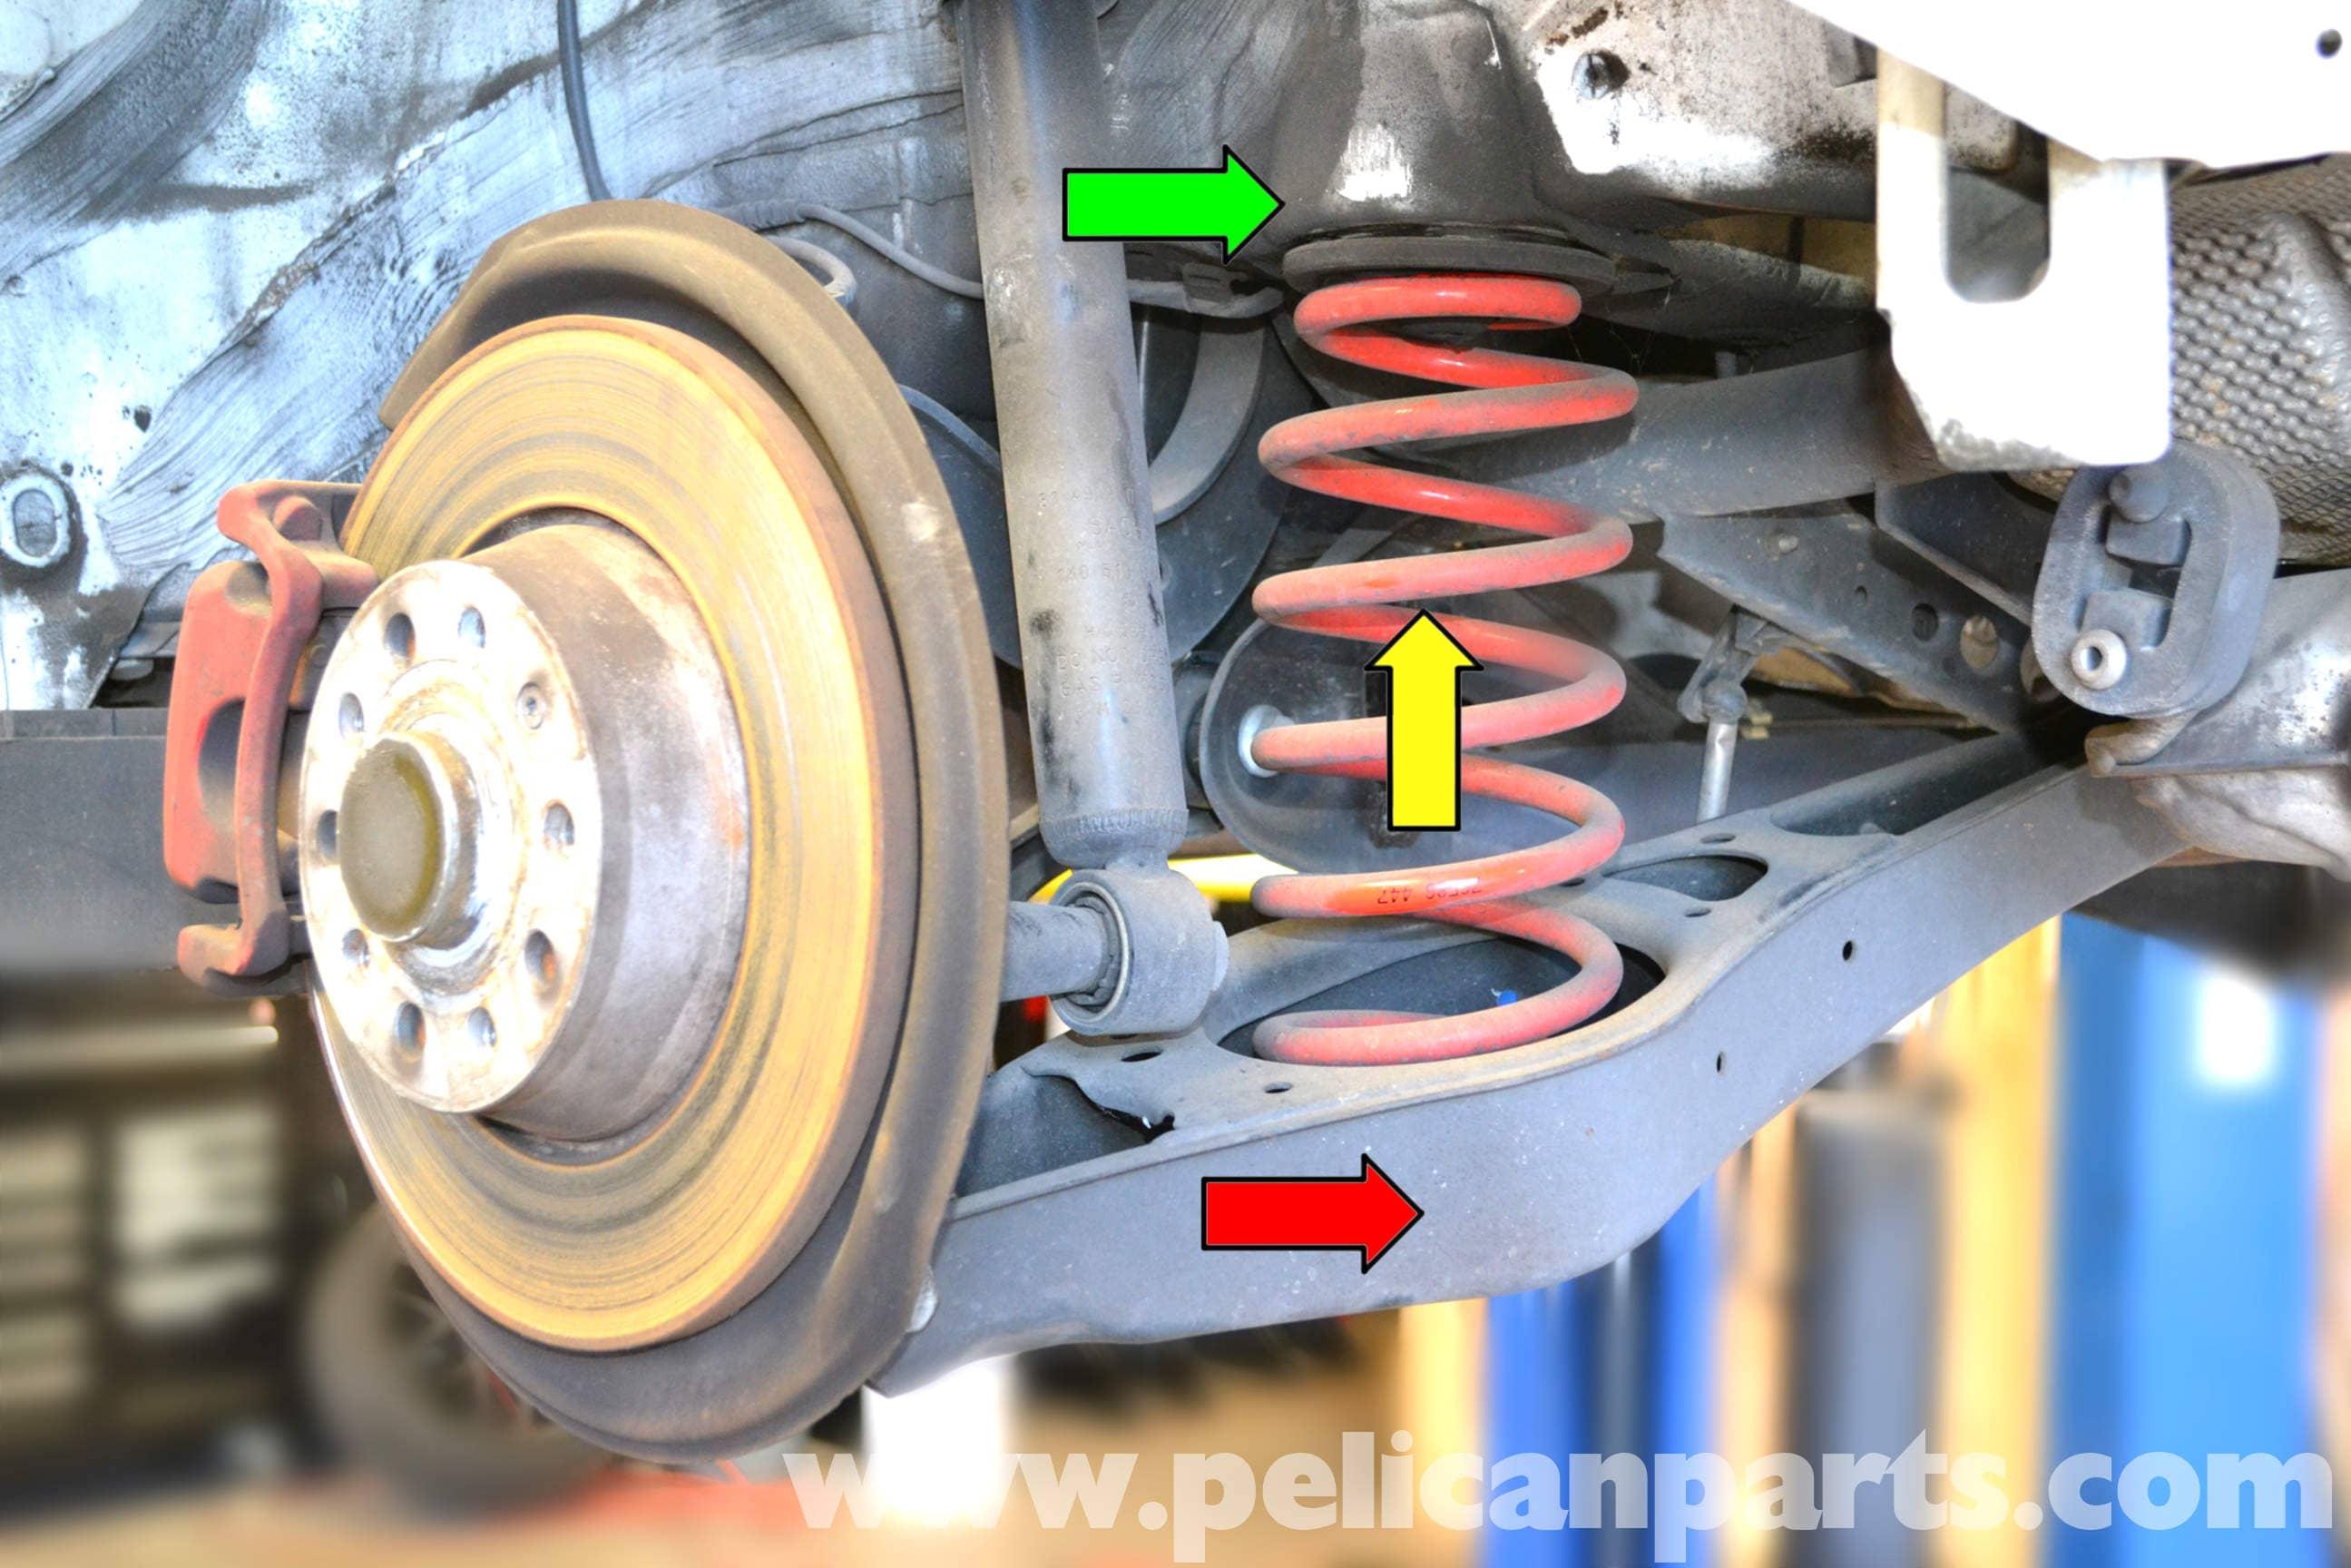 Volkswagen Golf GTI Mk V Rear Spring Replacement (2006-2009) - Pelican Parts DIY Maintenance Article